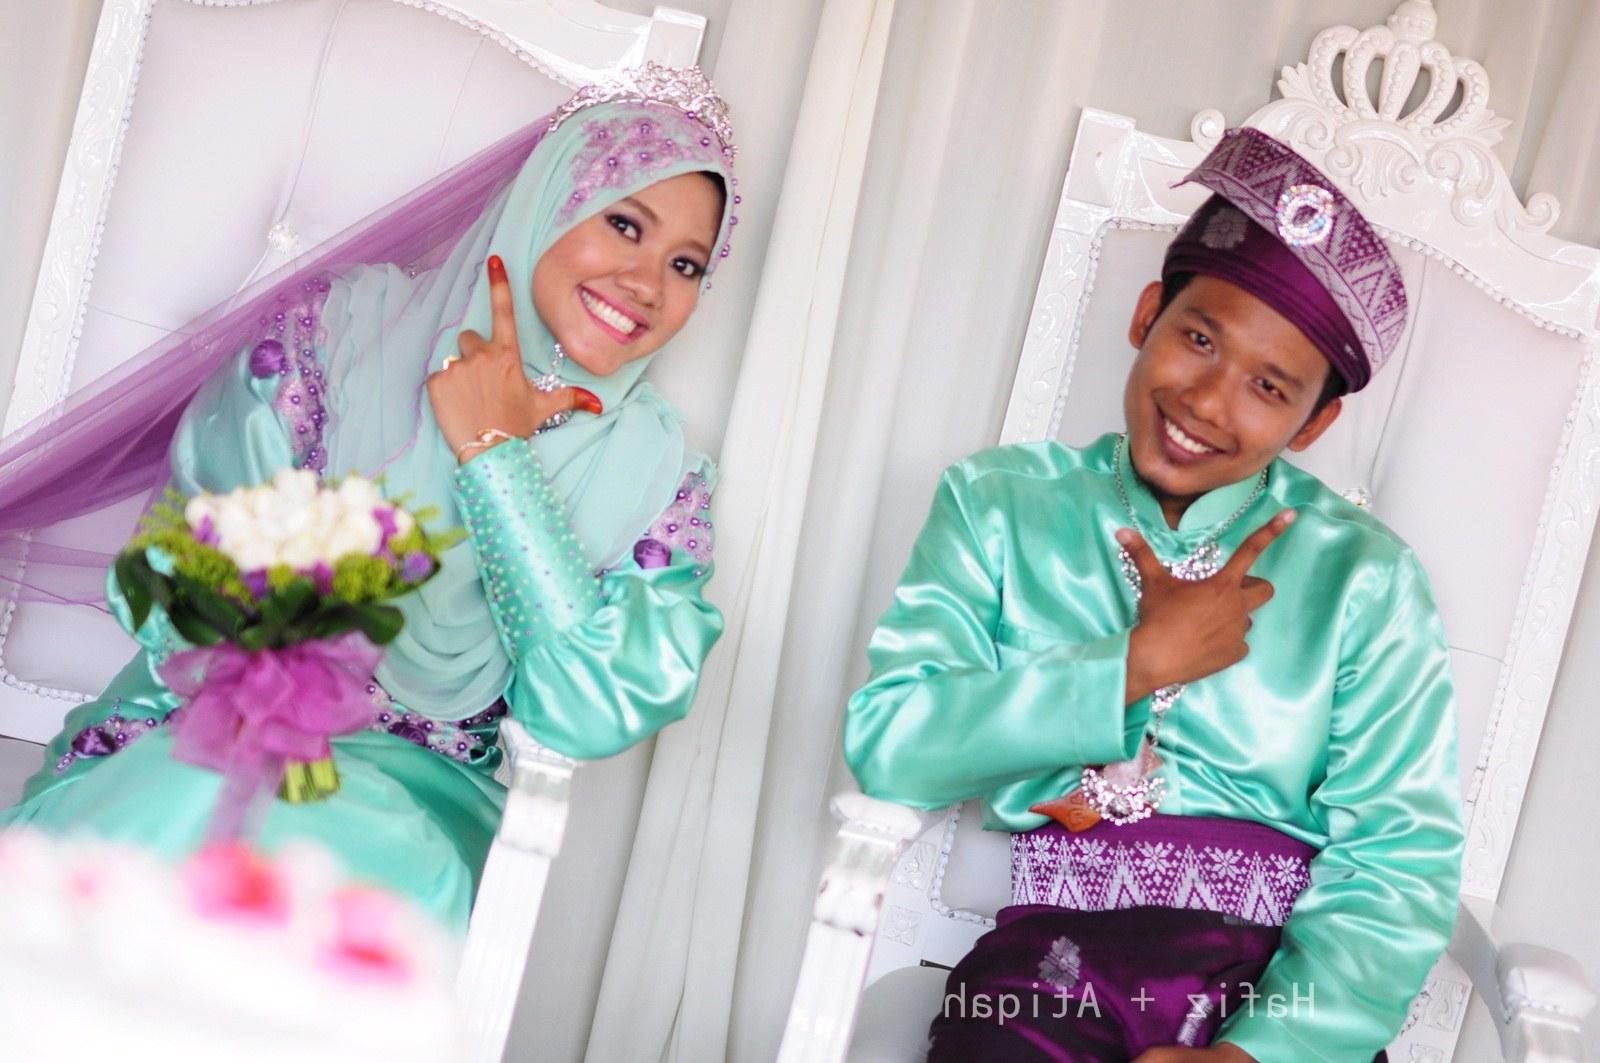 Inspirasi Baju Pasangan Pengantin Muslim Tqd3 36 Baju Pengantin songket Mint Green Modis Dan Cantik